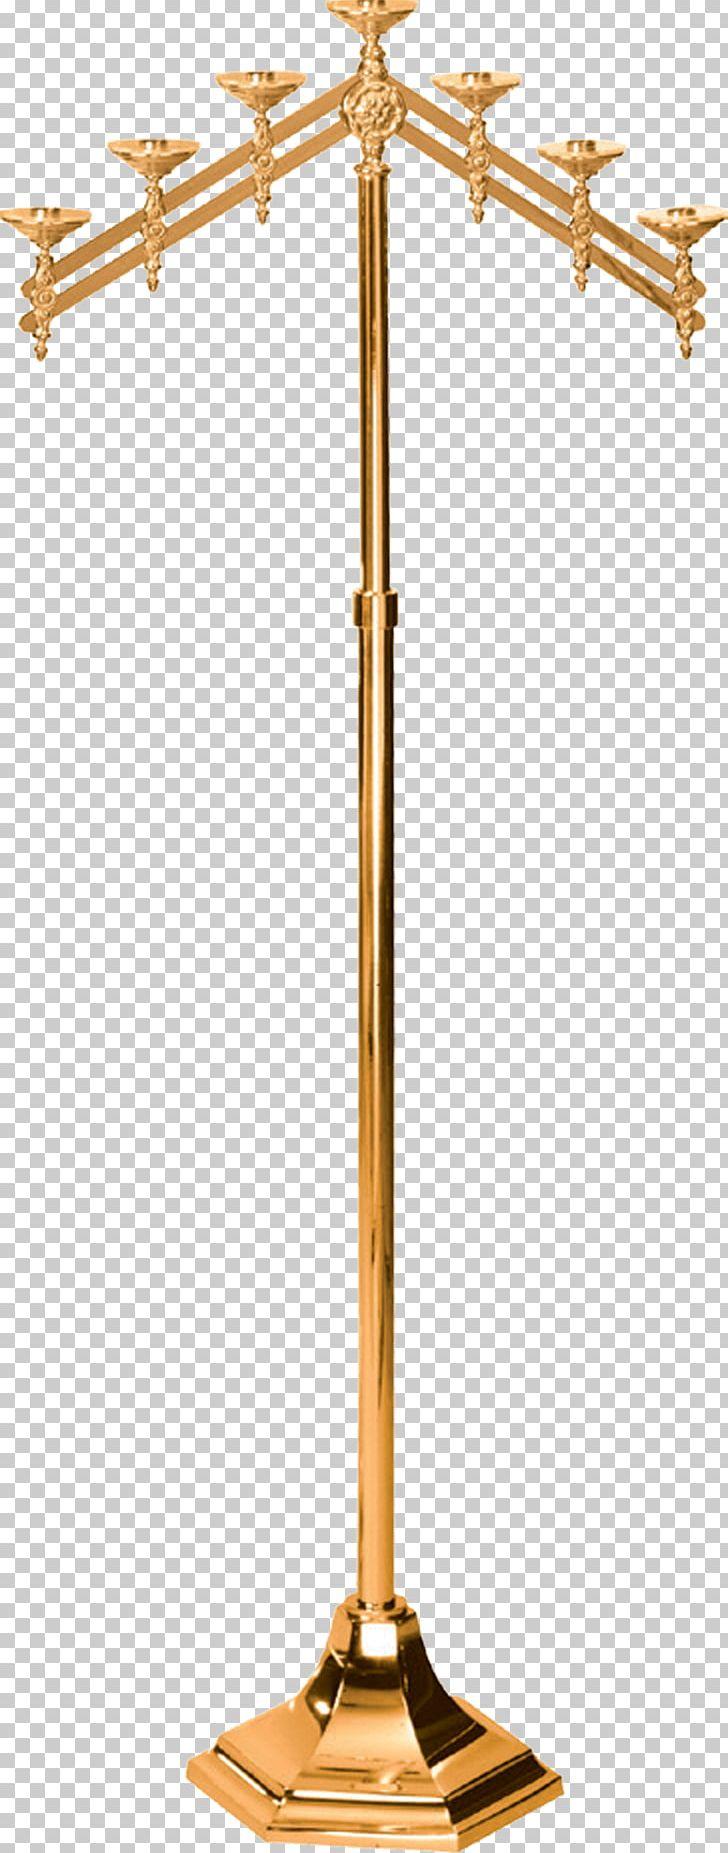 Crucifix Candelabra 01504 Bronze PNG, Clipart, 01504, Arm, Art, Autom, Brass Free PNG Download